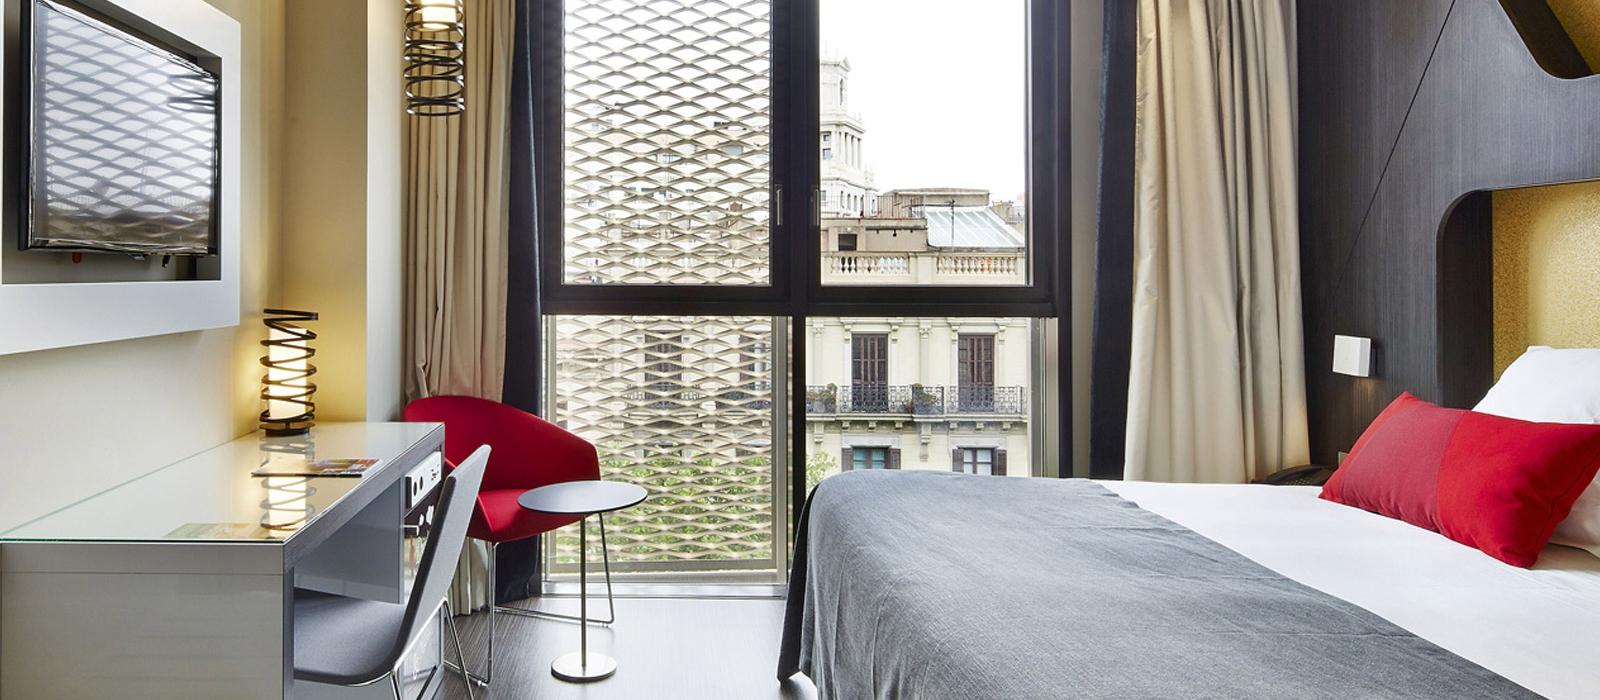 Doppelzimmer. Hotel Barcelona Gala - Vincci Hoteles